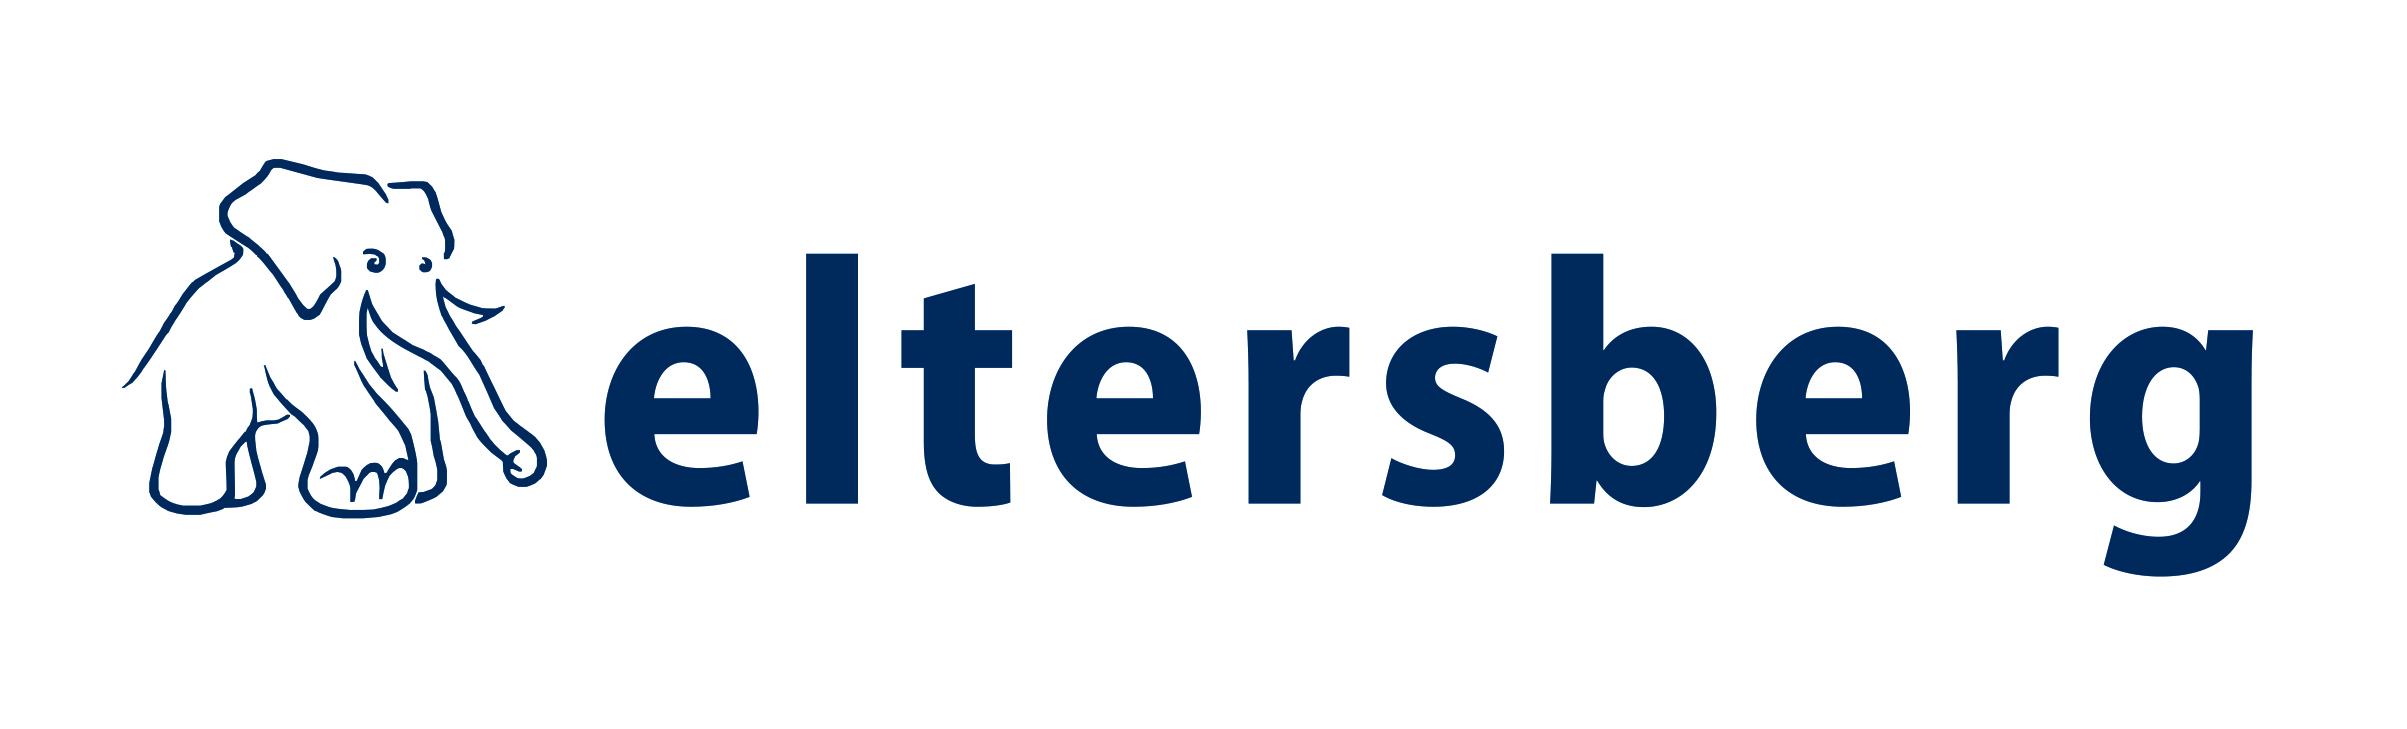 Basalt- und Betonwerk Eltersberg GmbH & Co. KG